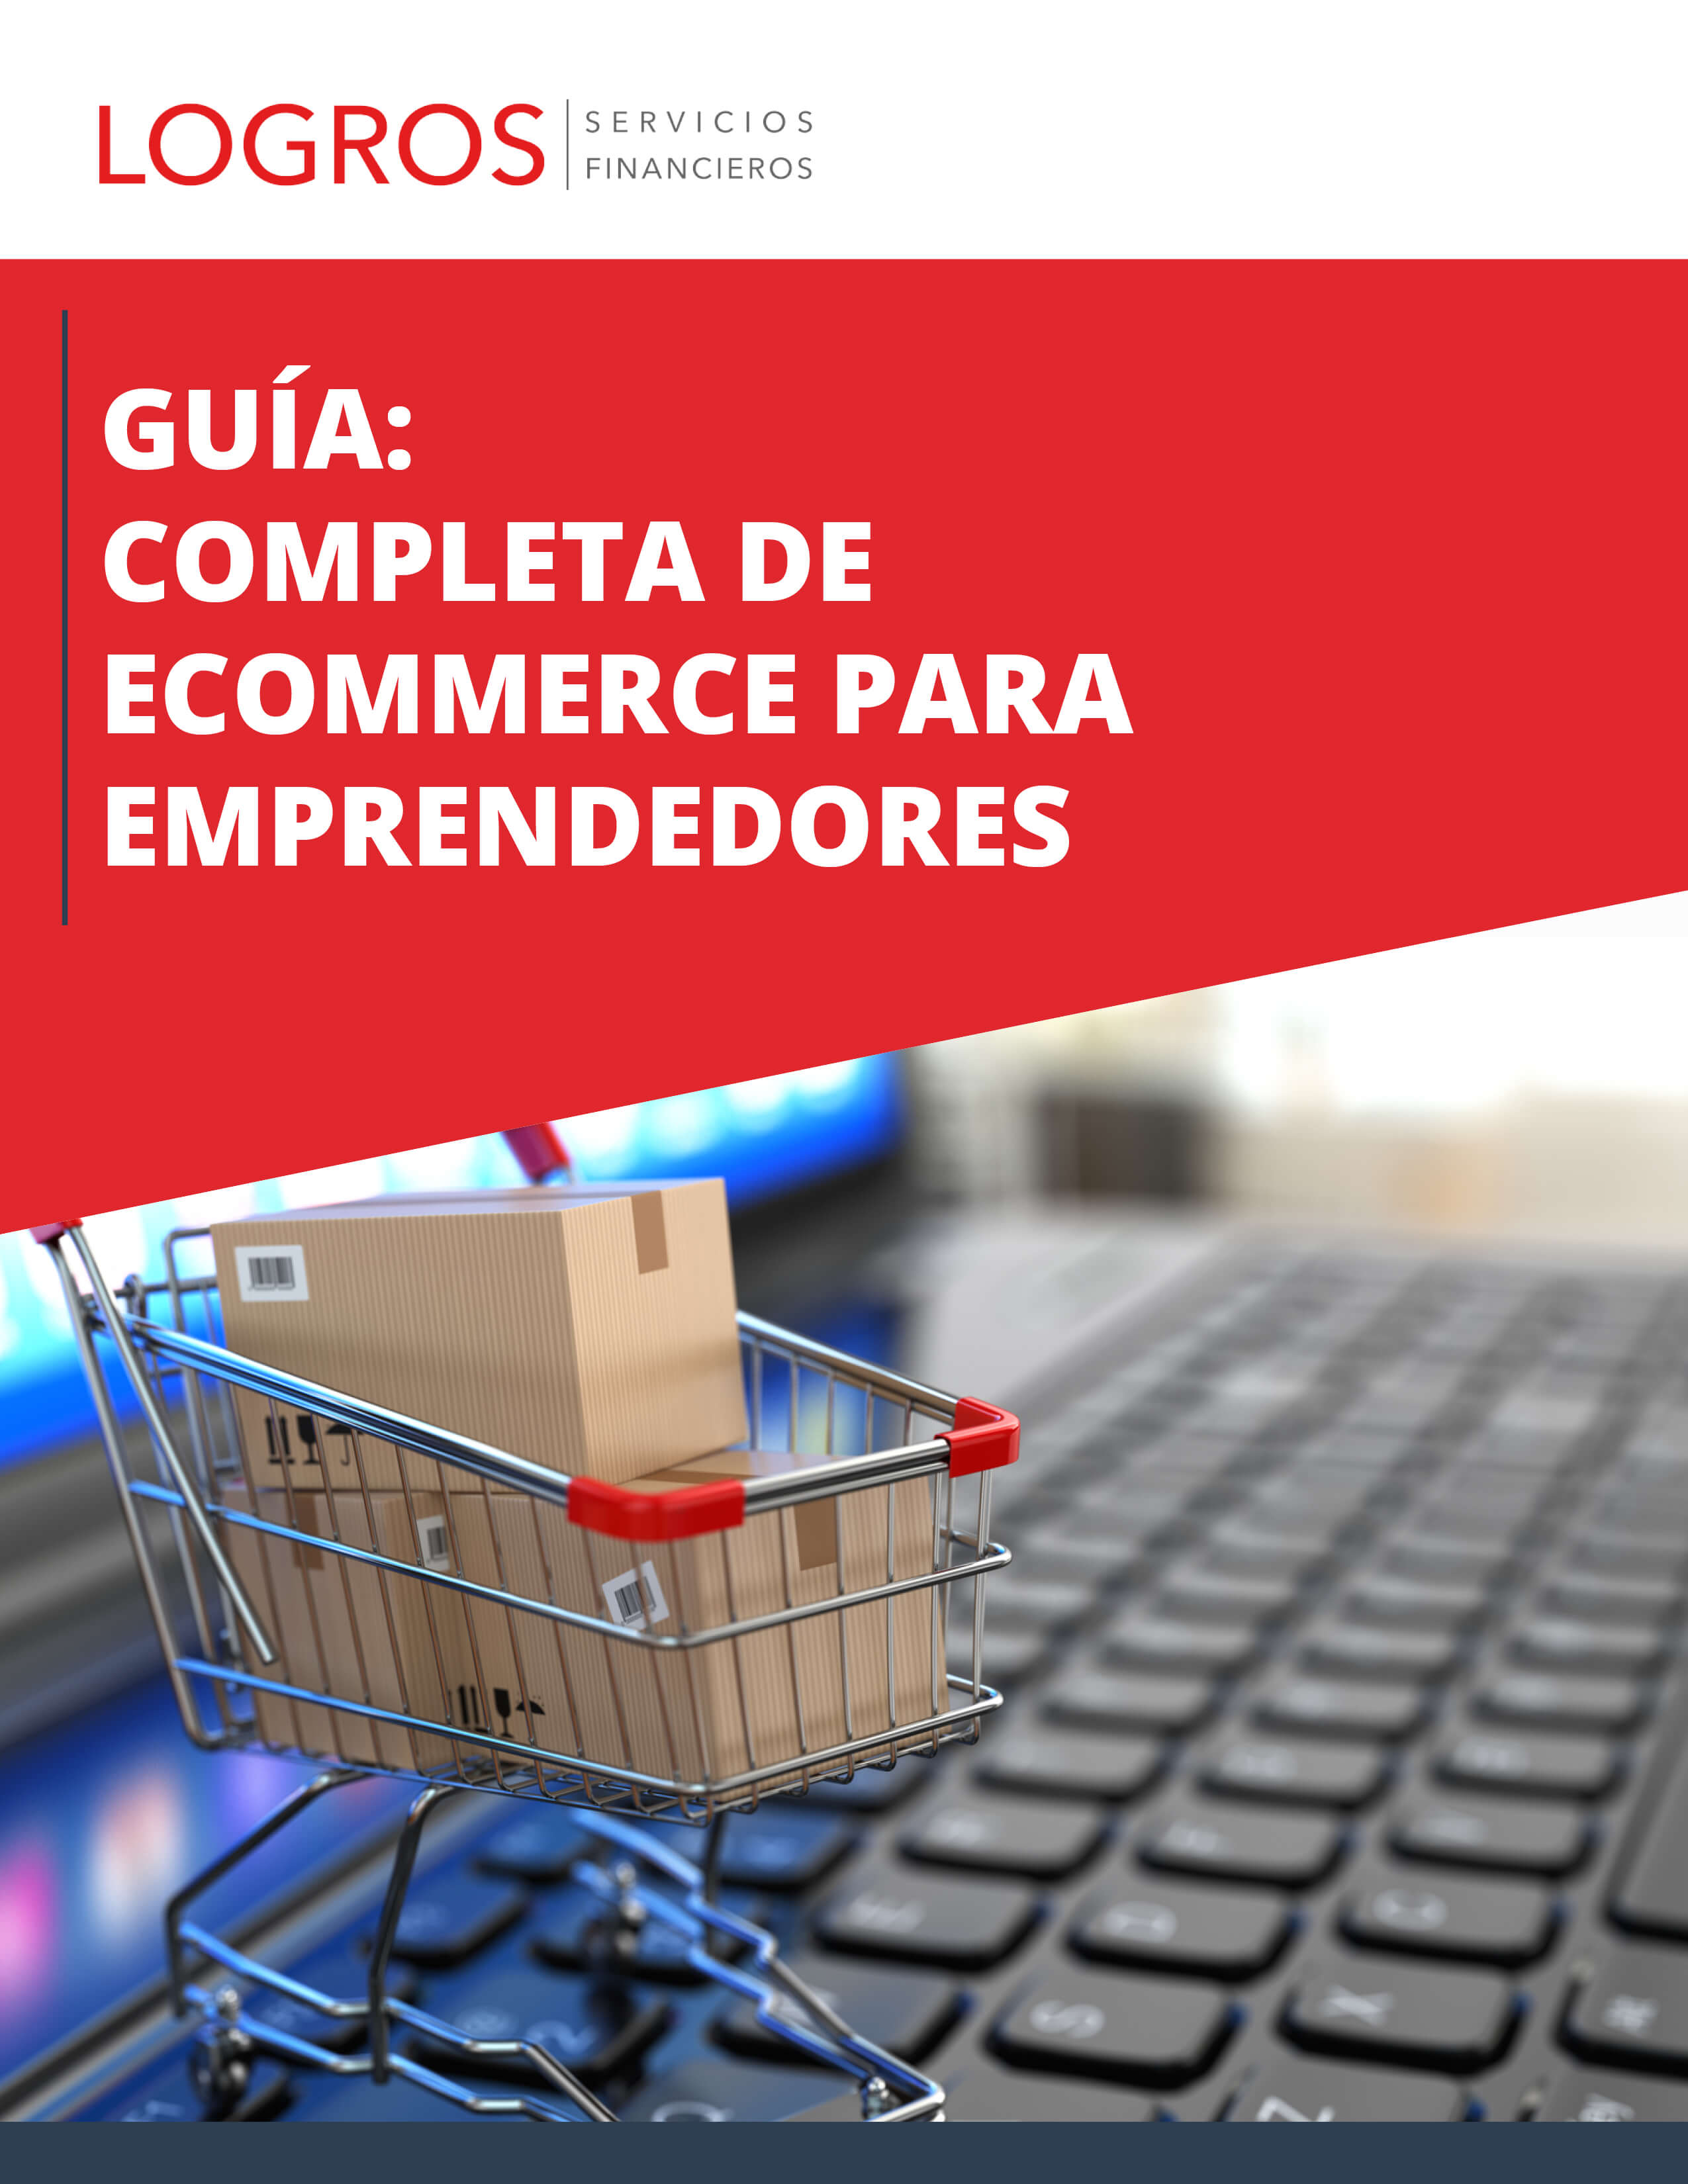 Guía Completa De eCommerce Para Emprendedores